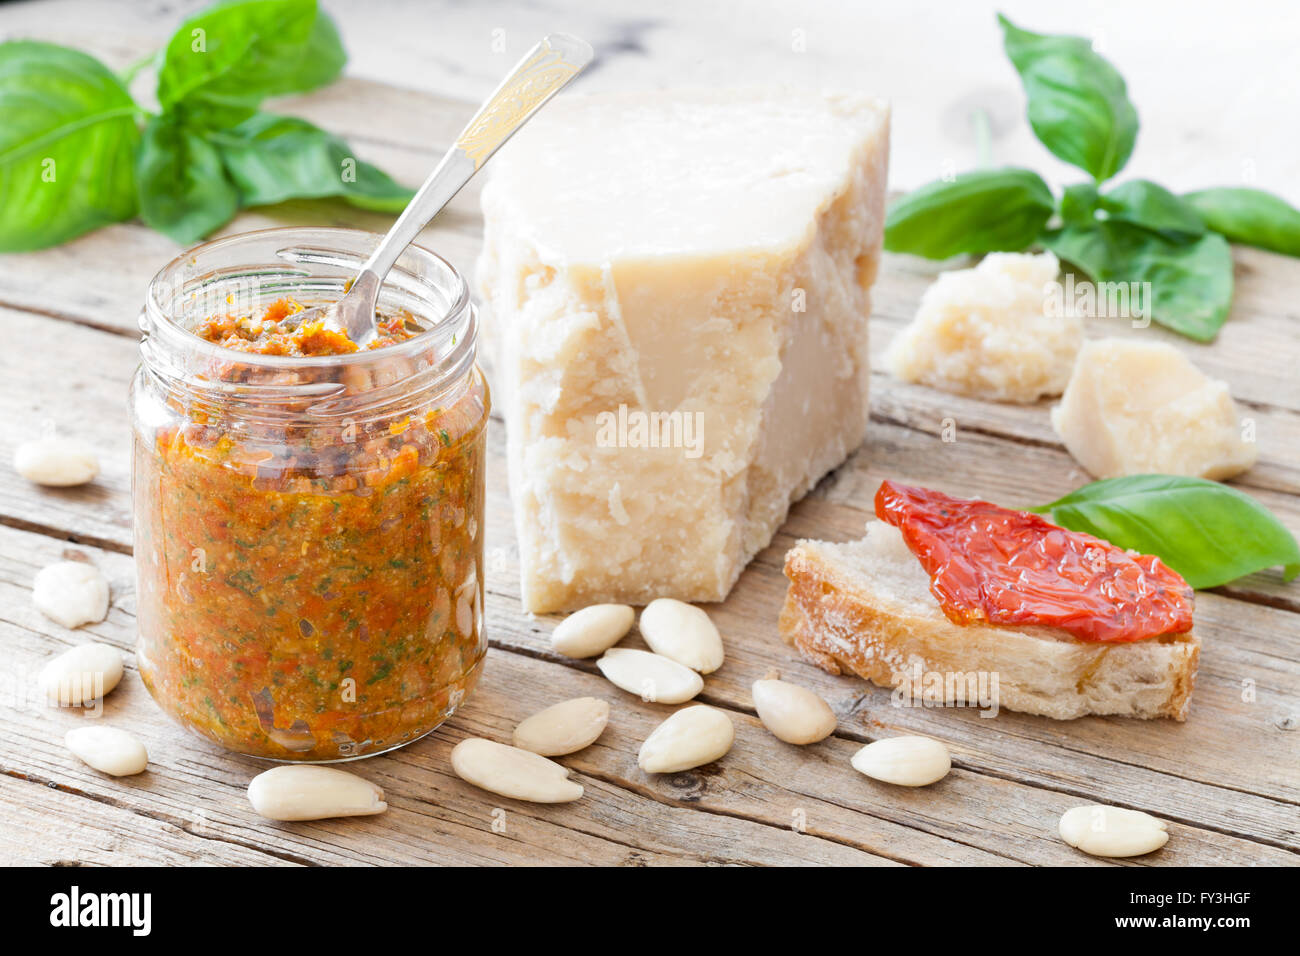 Getrocknete Tomaten-Pesto mit Mandeln und Basilikum Stockbild